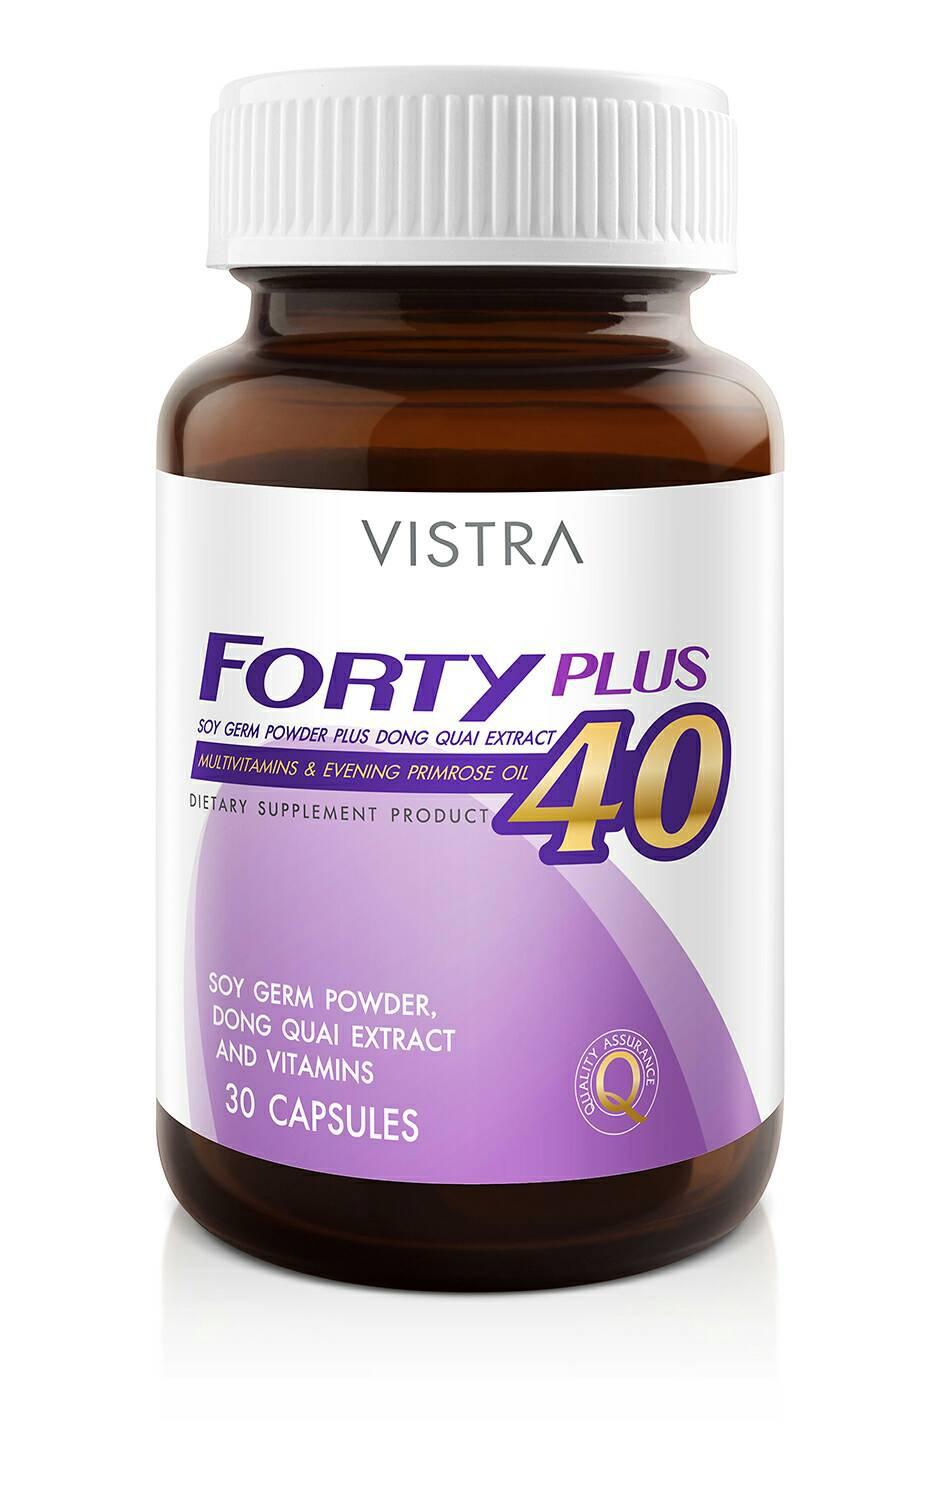 Vistra Forty Plus 40 Soy germ Powder plus Dong Quai Extract 30 caspsules.